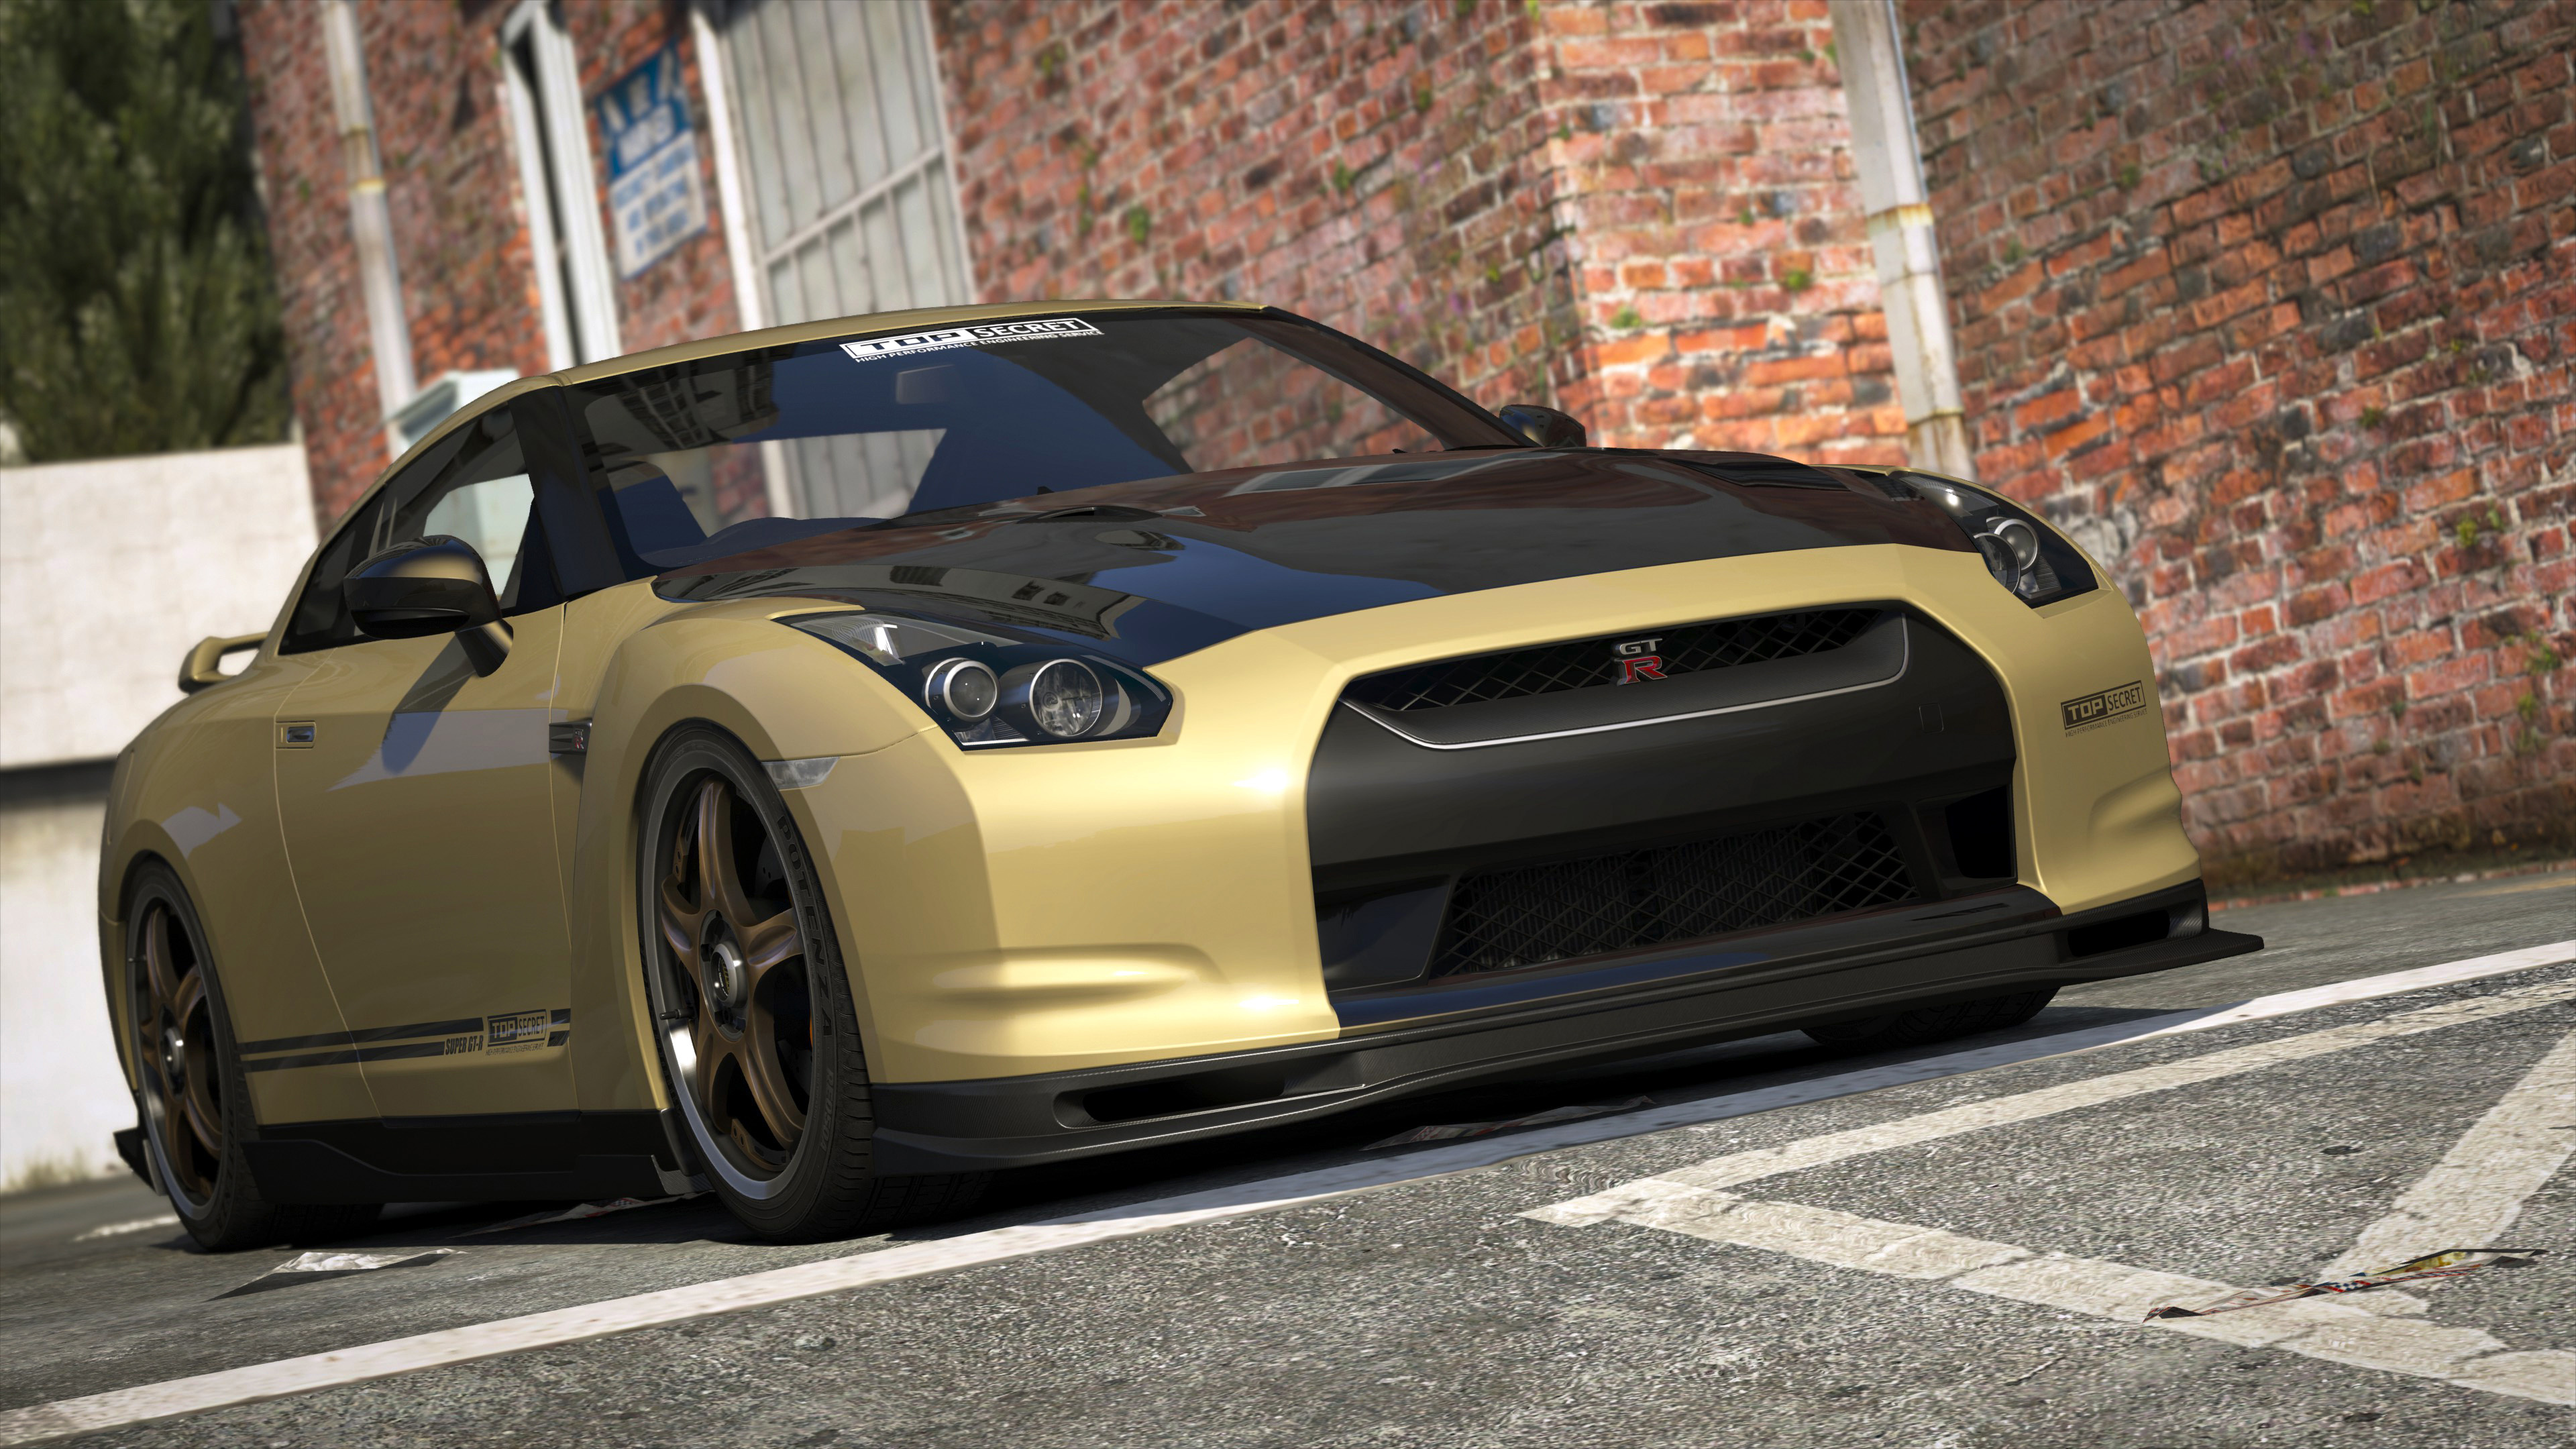 Nissan GTR (R35) [Add-On   Tuning   RHD   Template] - GTA5 ...